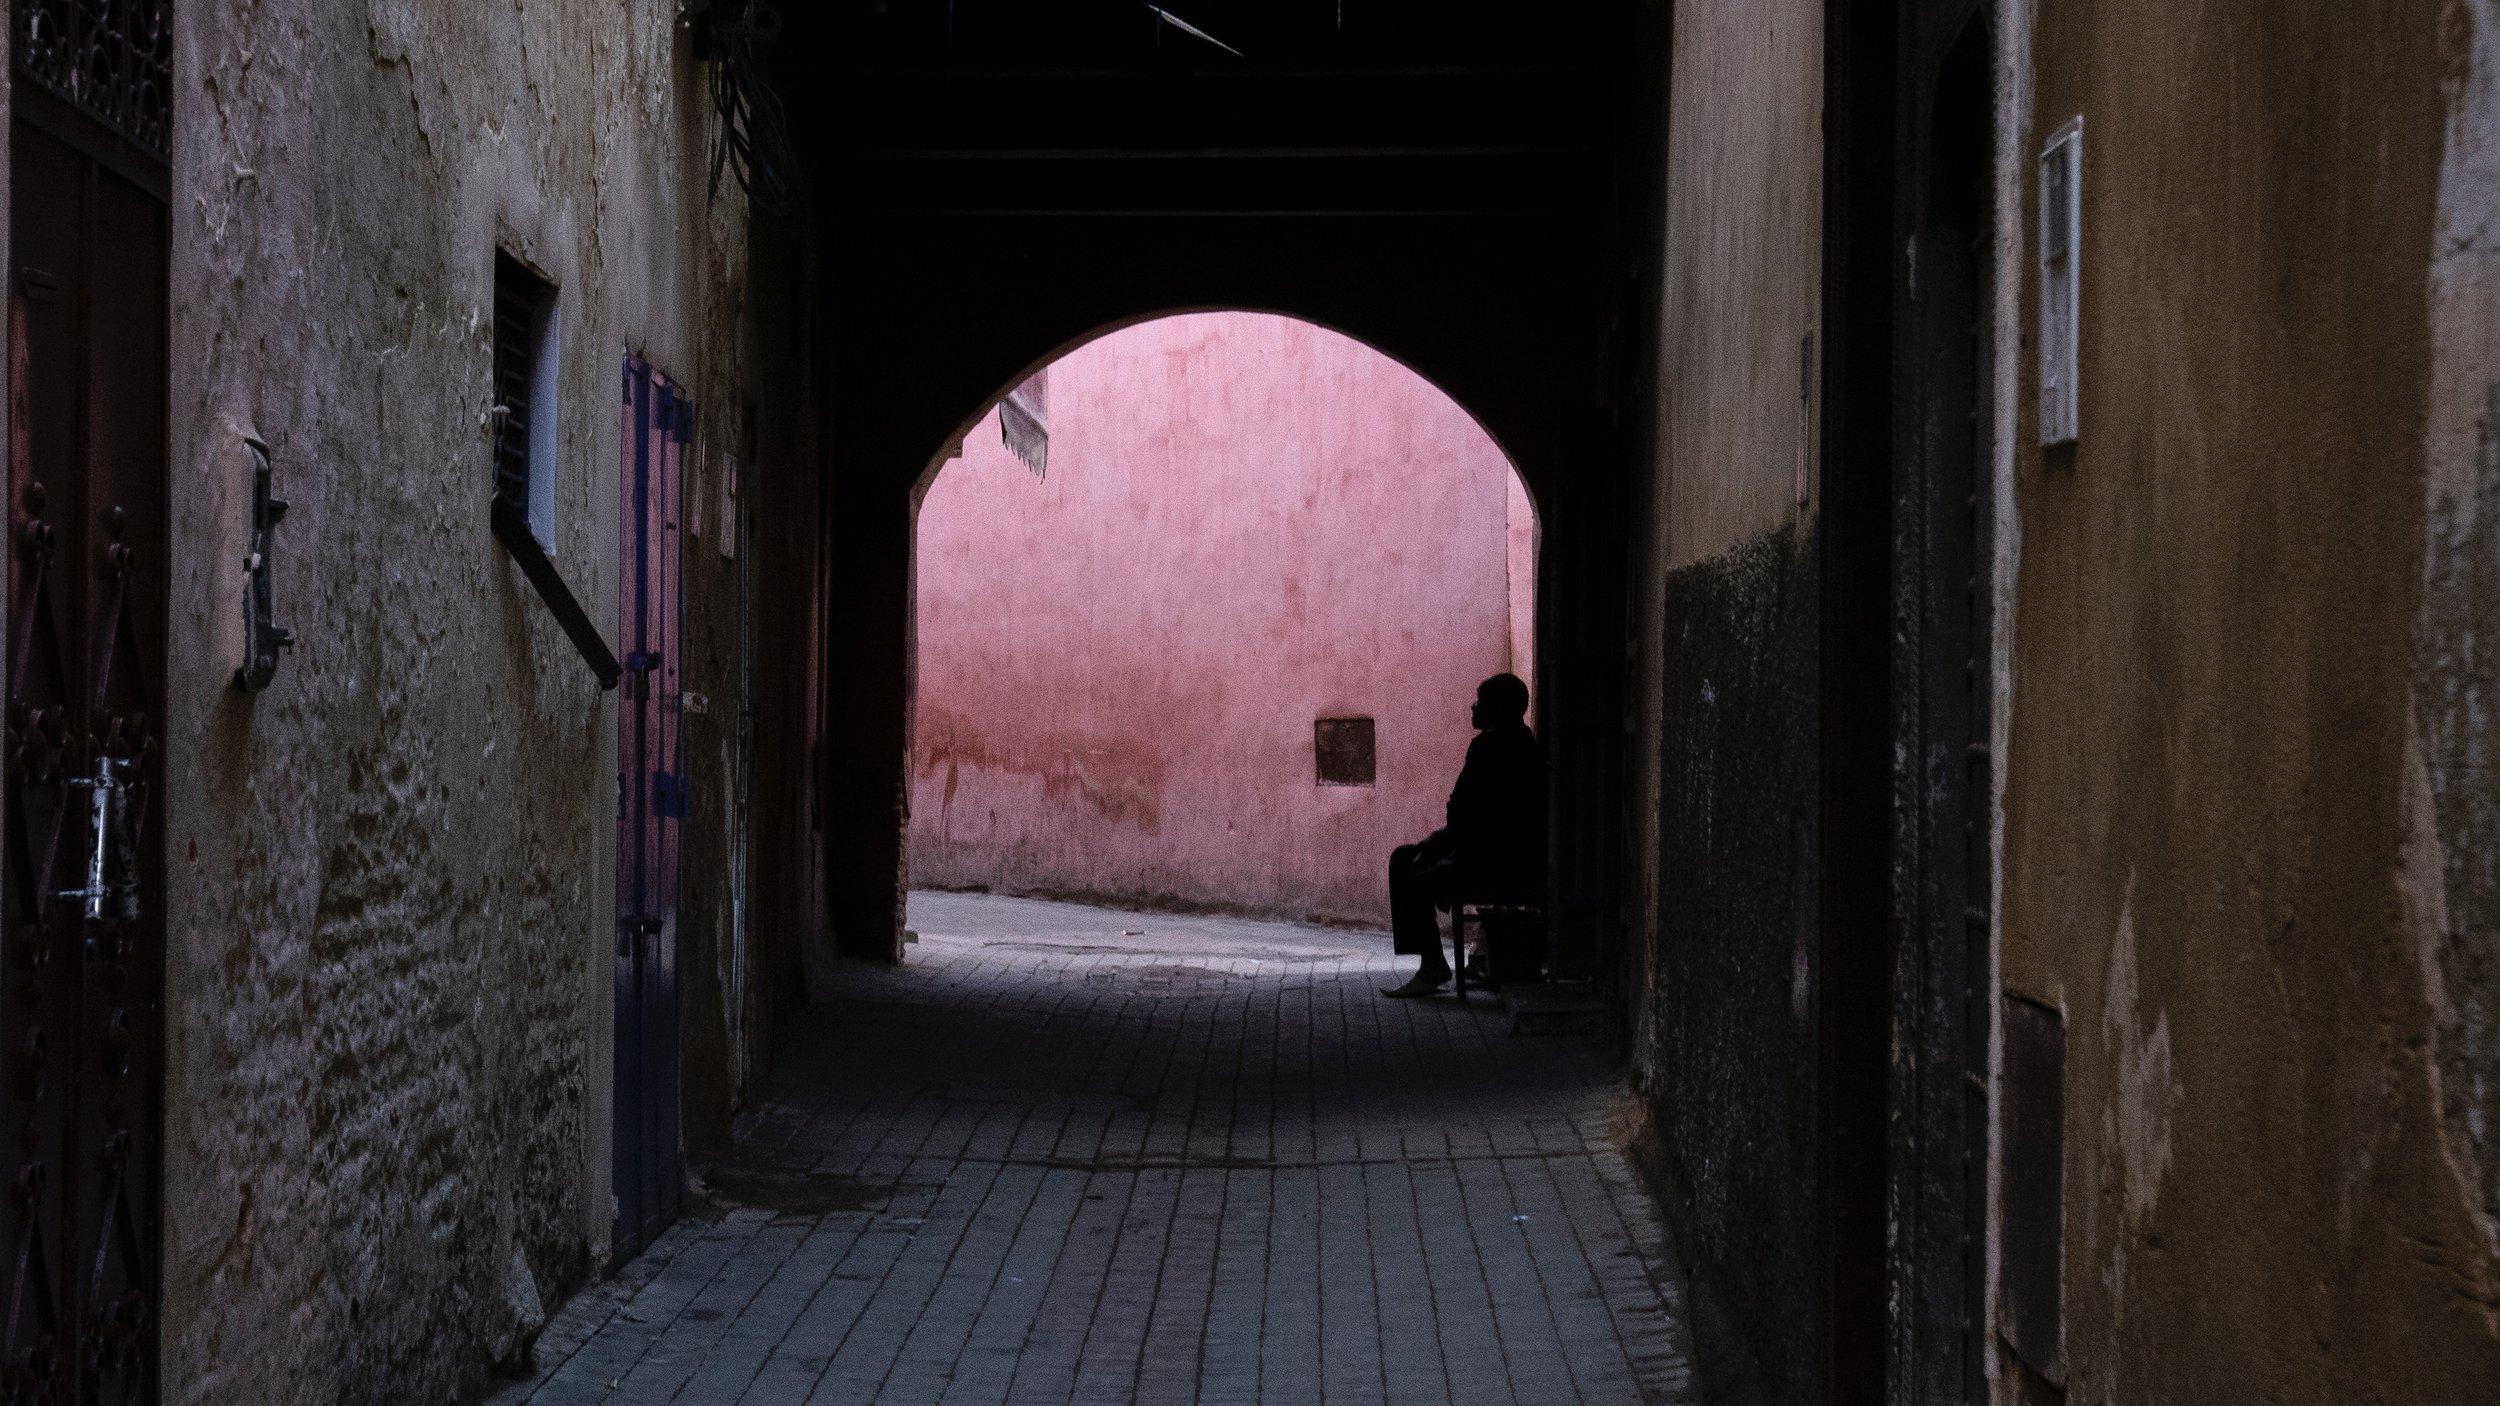 Morocco, Photo by  Fabio Santaniello Bruun  on  Unsplash